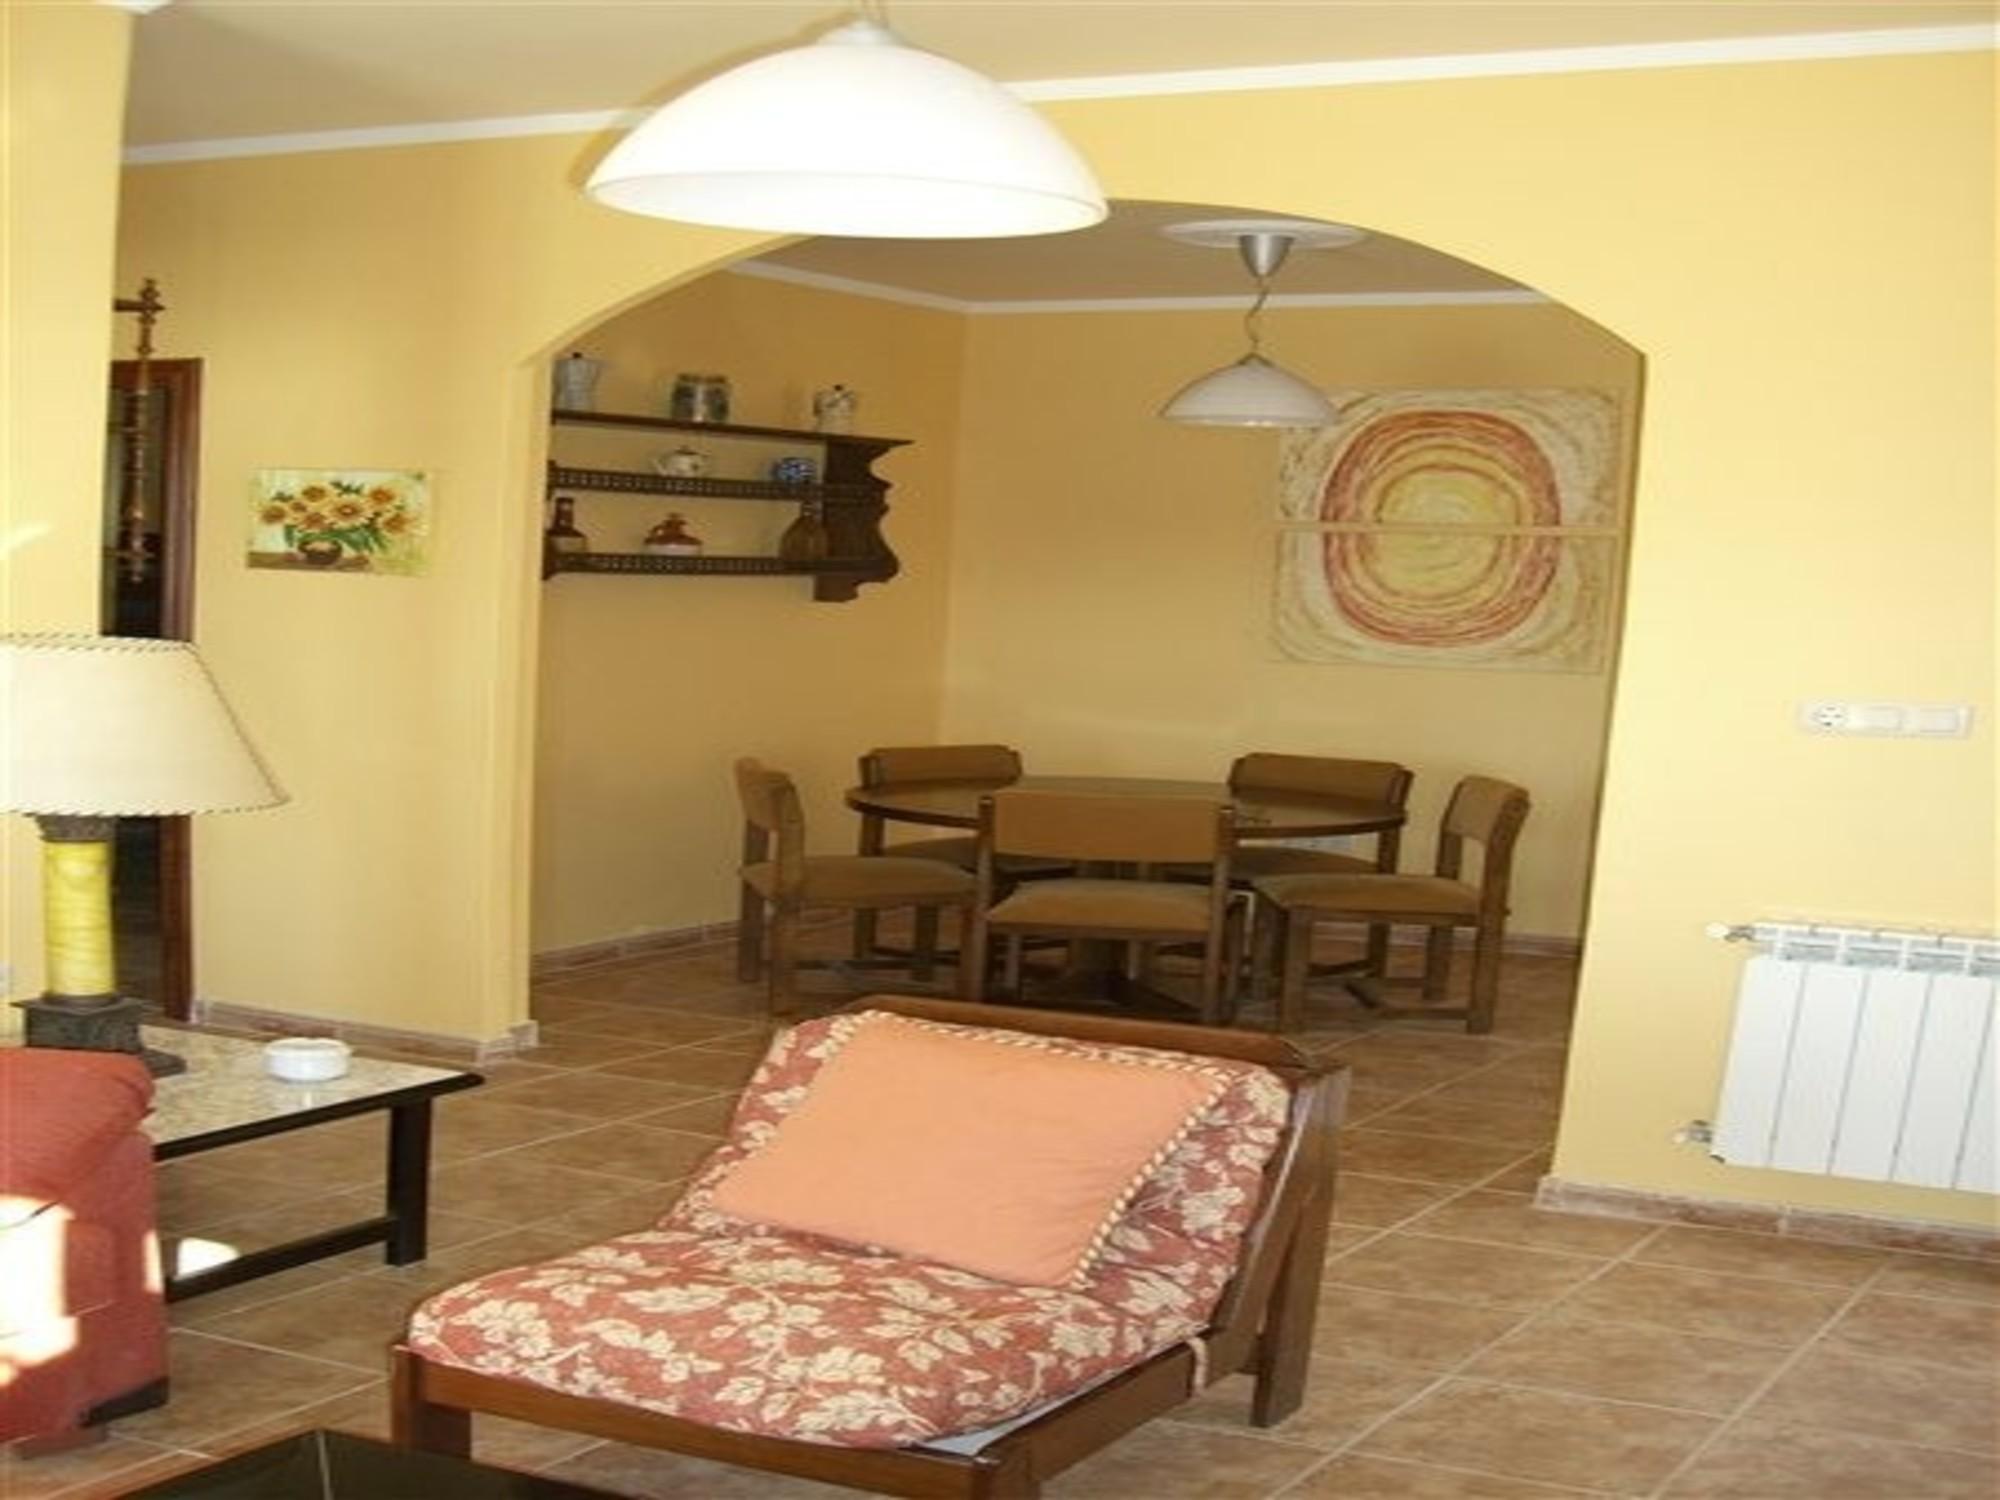 Ferienwohnung Apartment - 2 Bedrooms - 100119 (1937591), Vigo, Rias Bajas, Galicien, Spanien, Bild 4